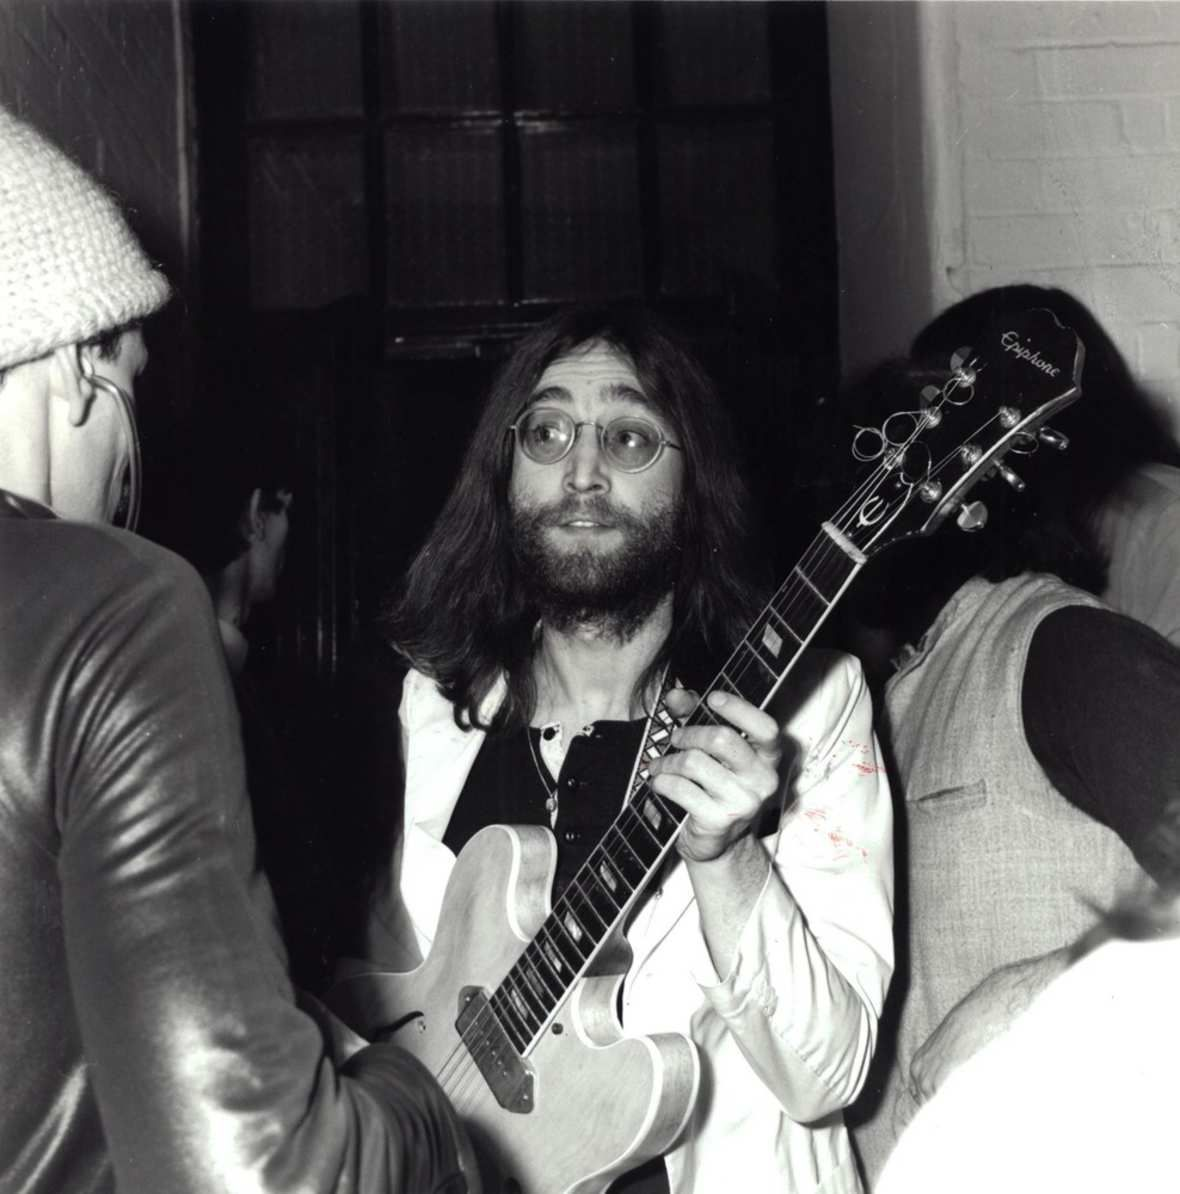 「john lennon 1969」の画像検索結果